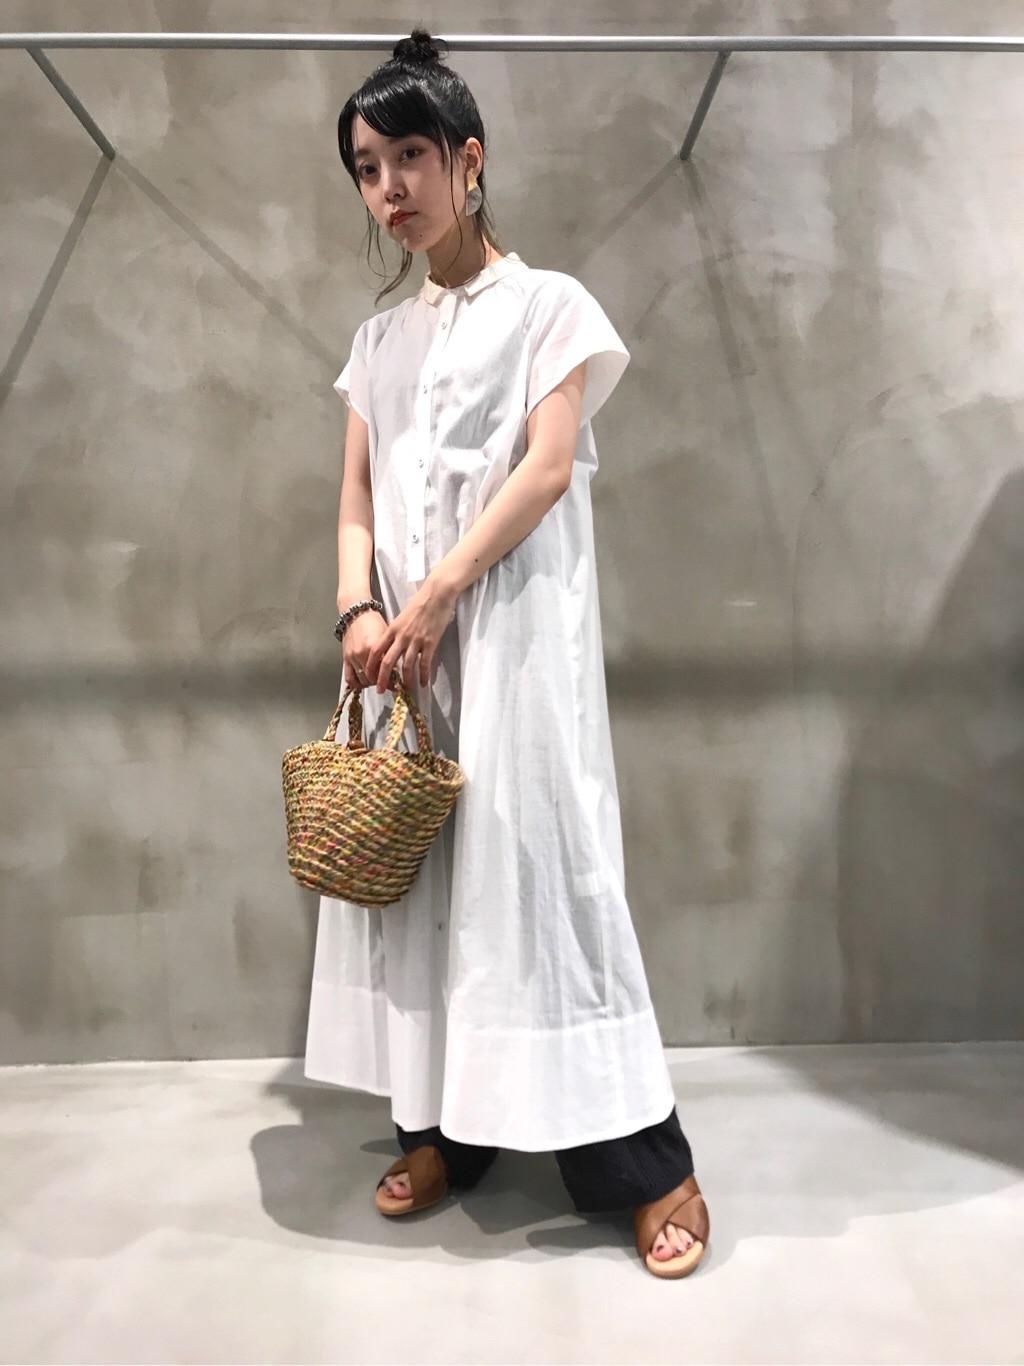 bulle de savon 渋谷スクランブルスクエア 身長:153cm 2020.06.14